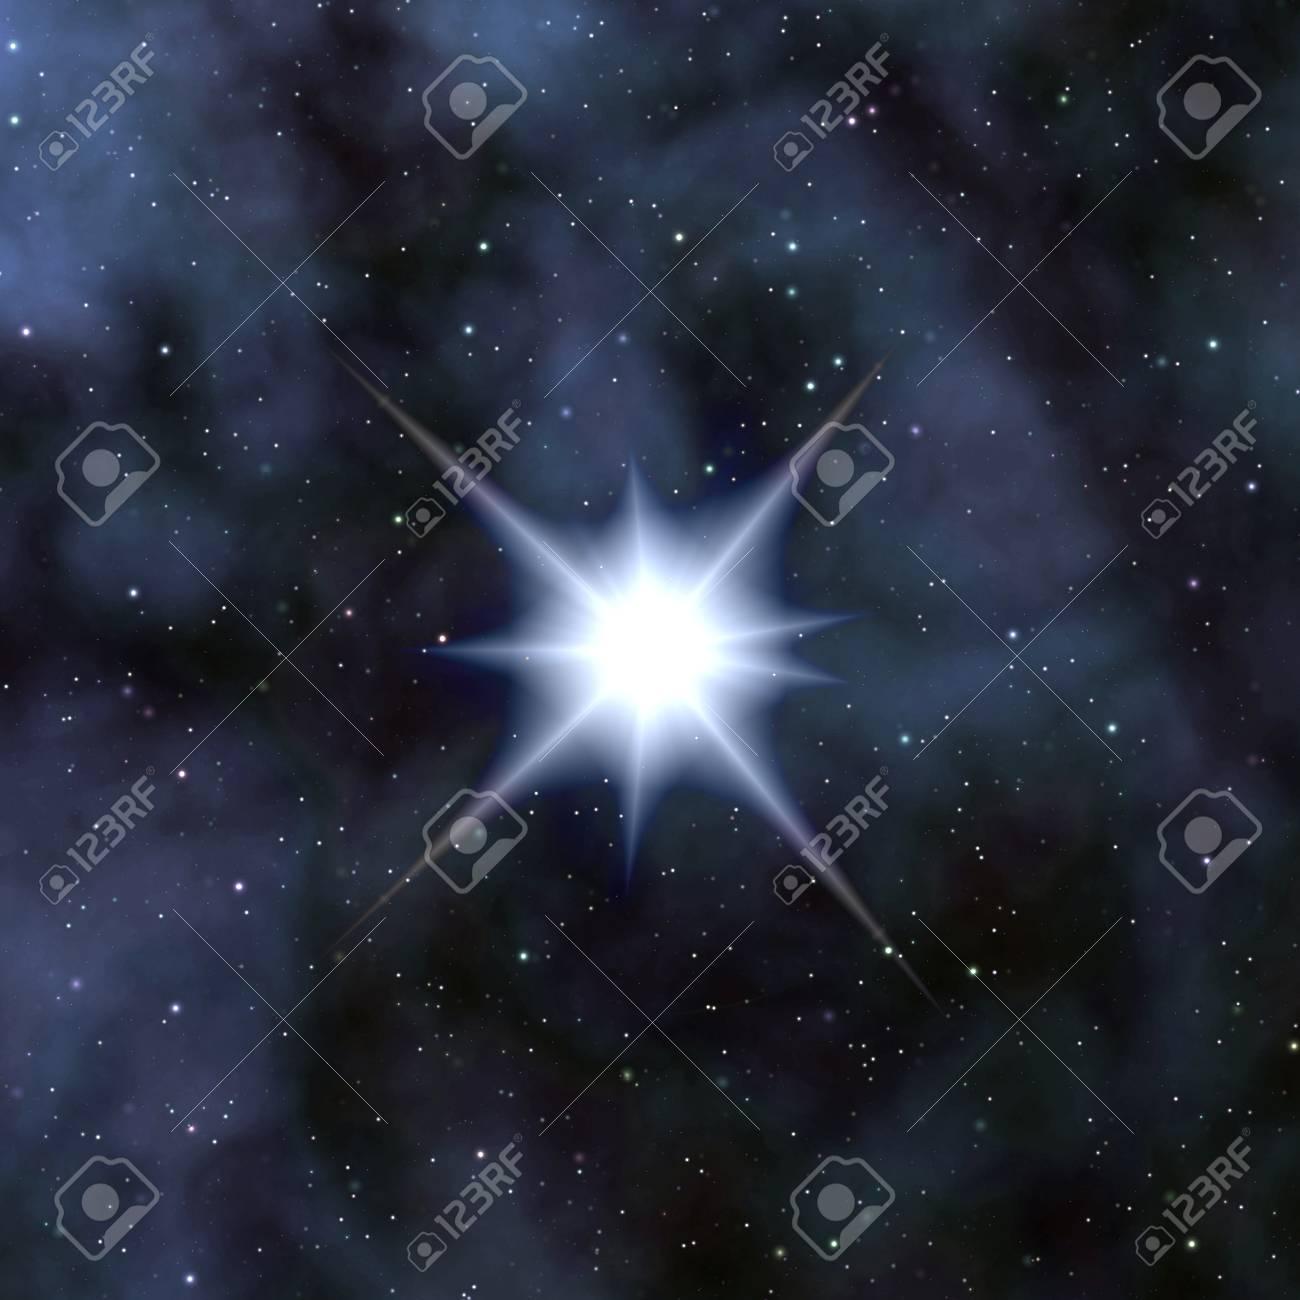 Stars in the night sky Stock Photo - 10742858